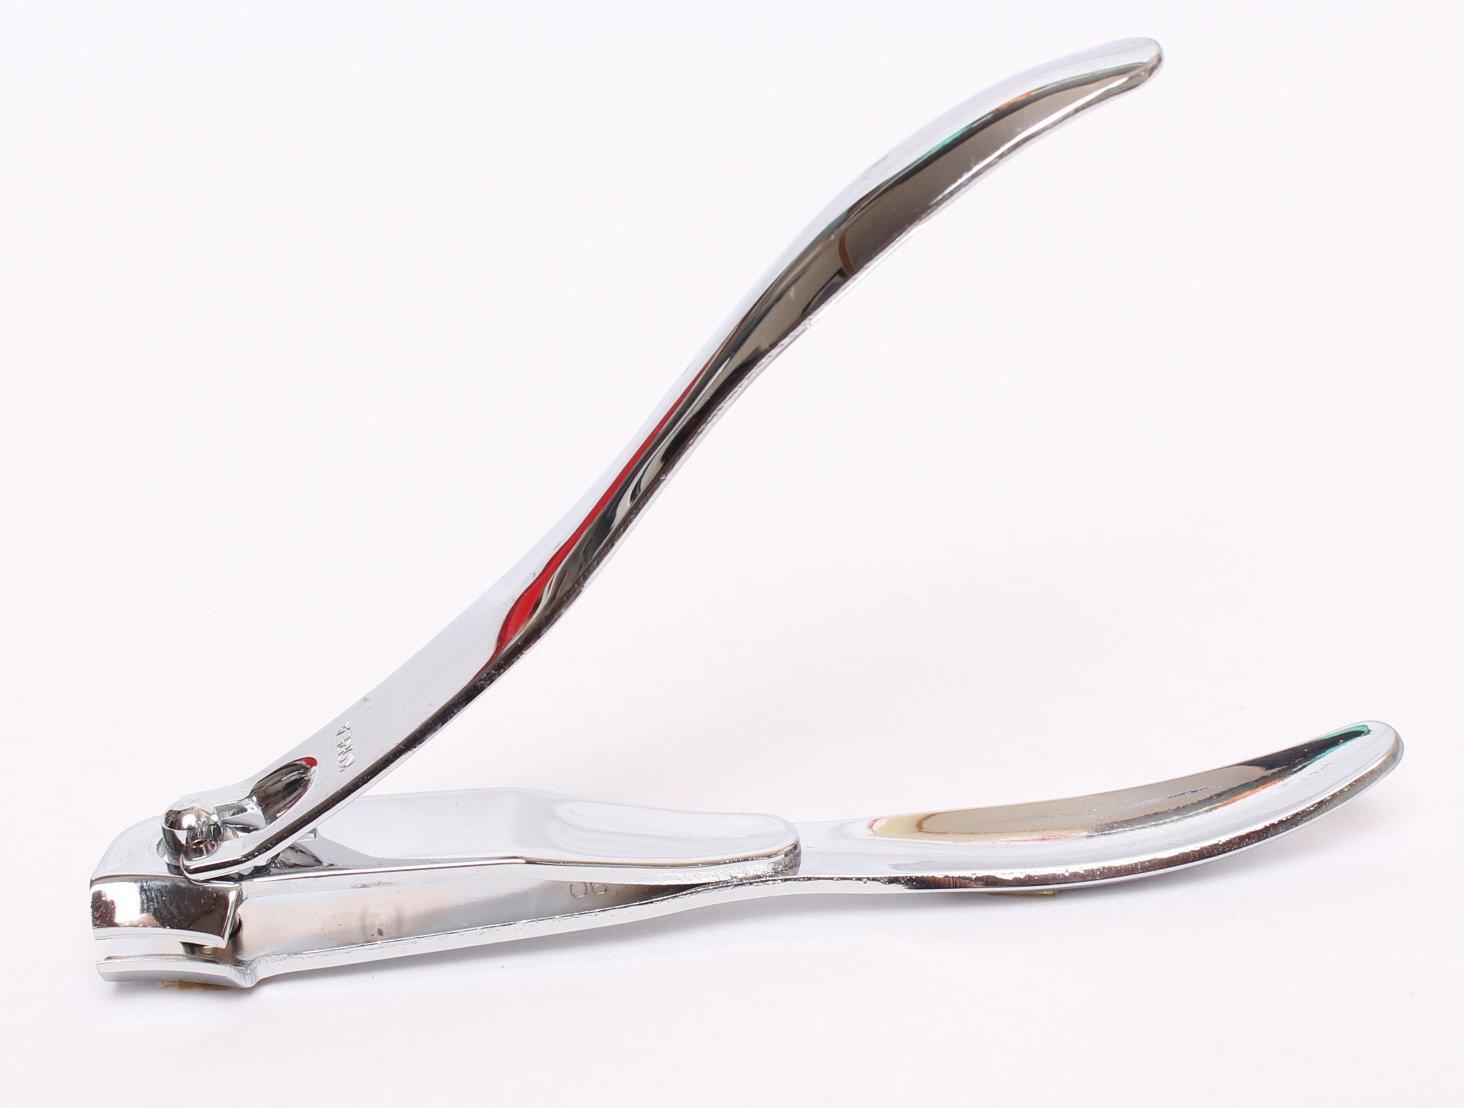 Amazon.com : Side Cutting Toe Nail Clipper Manicure Pedicure Beauty ...